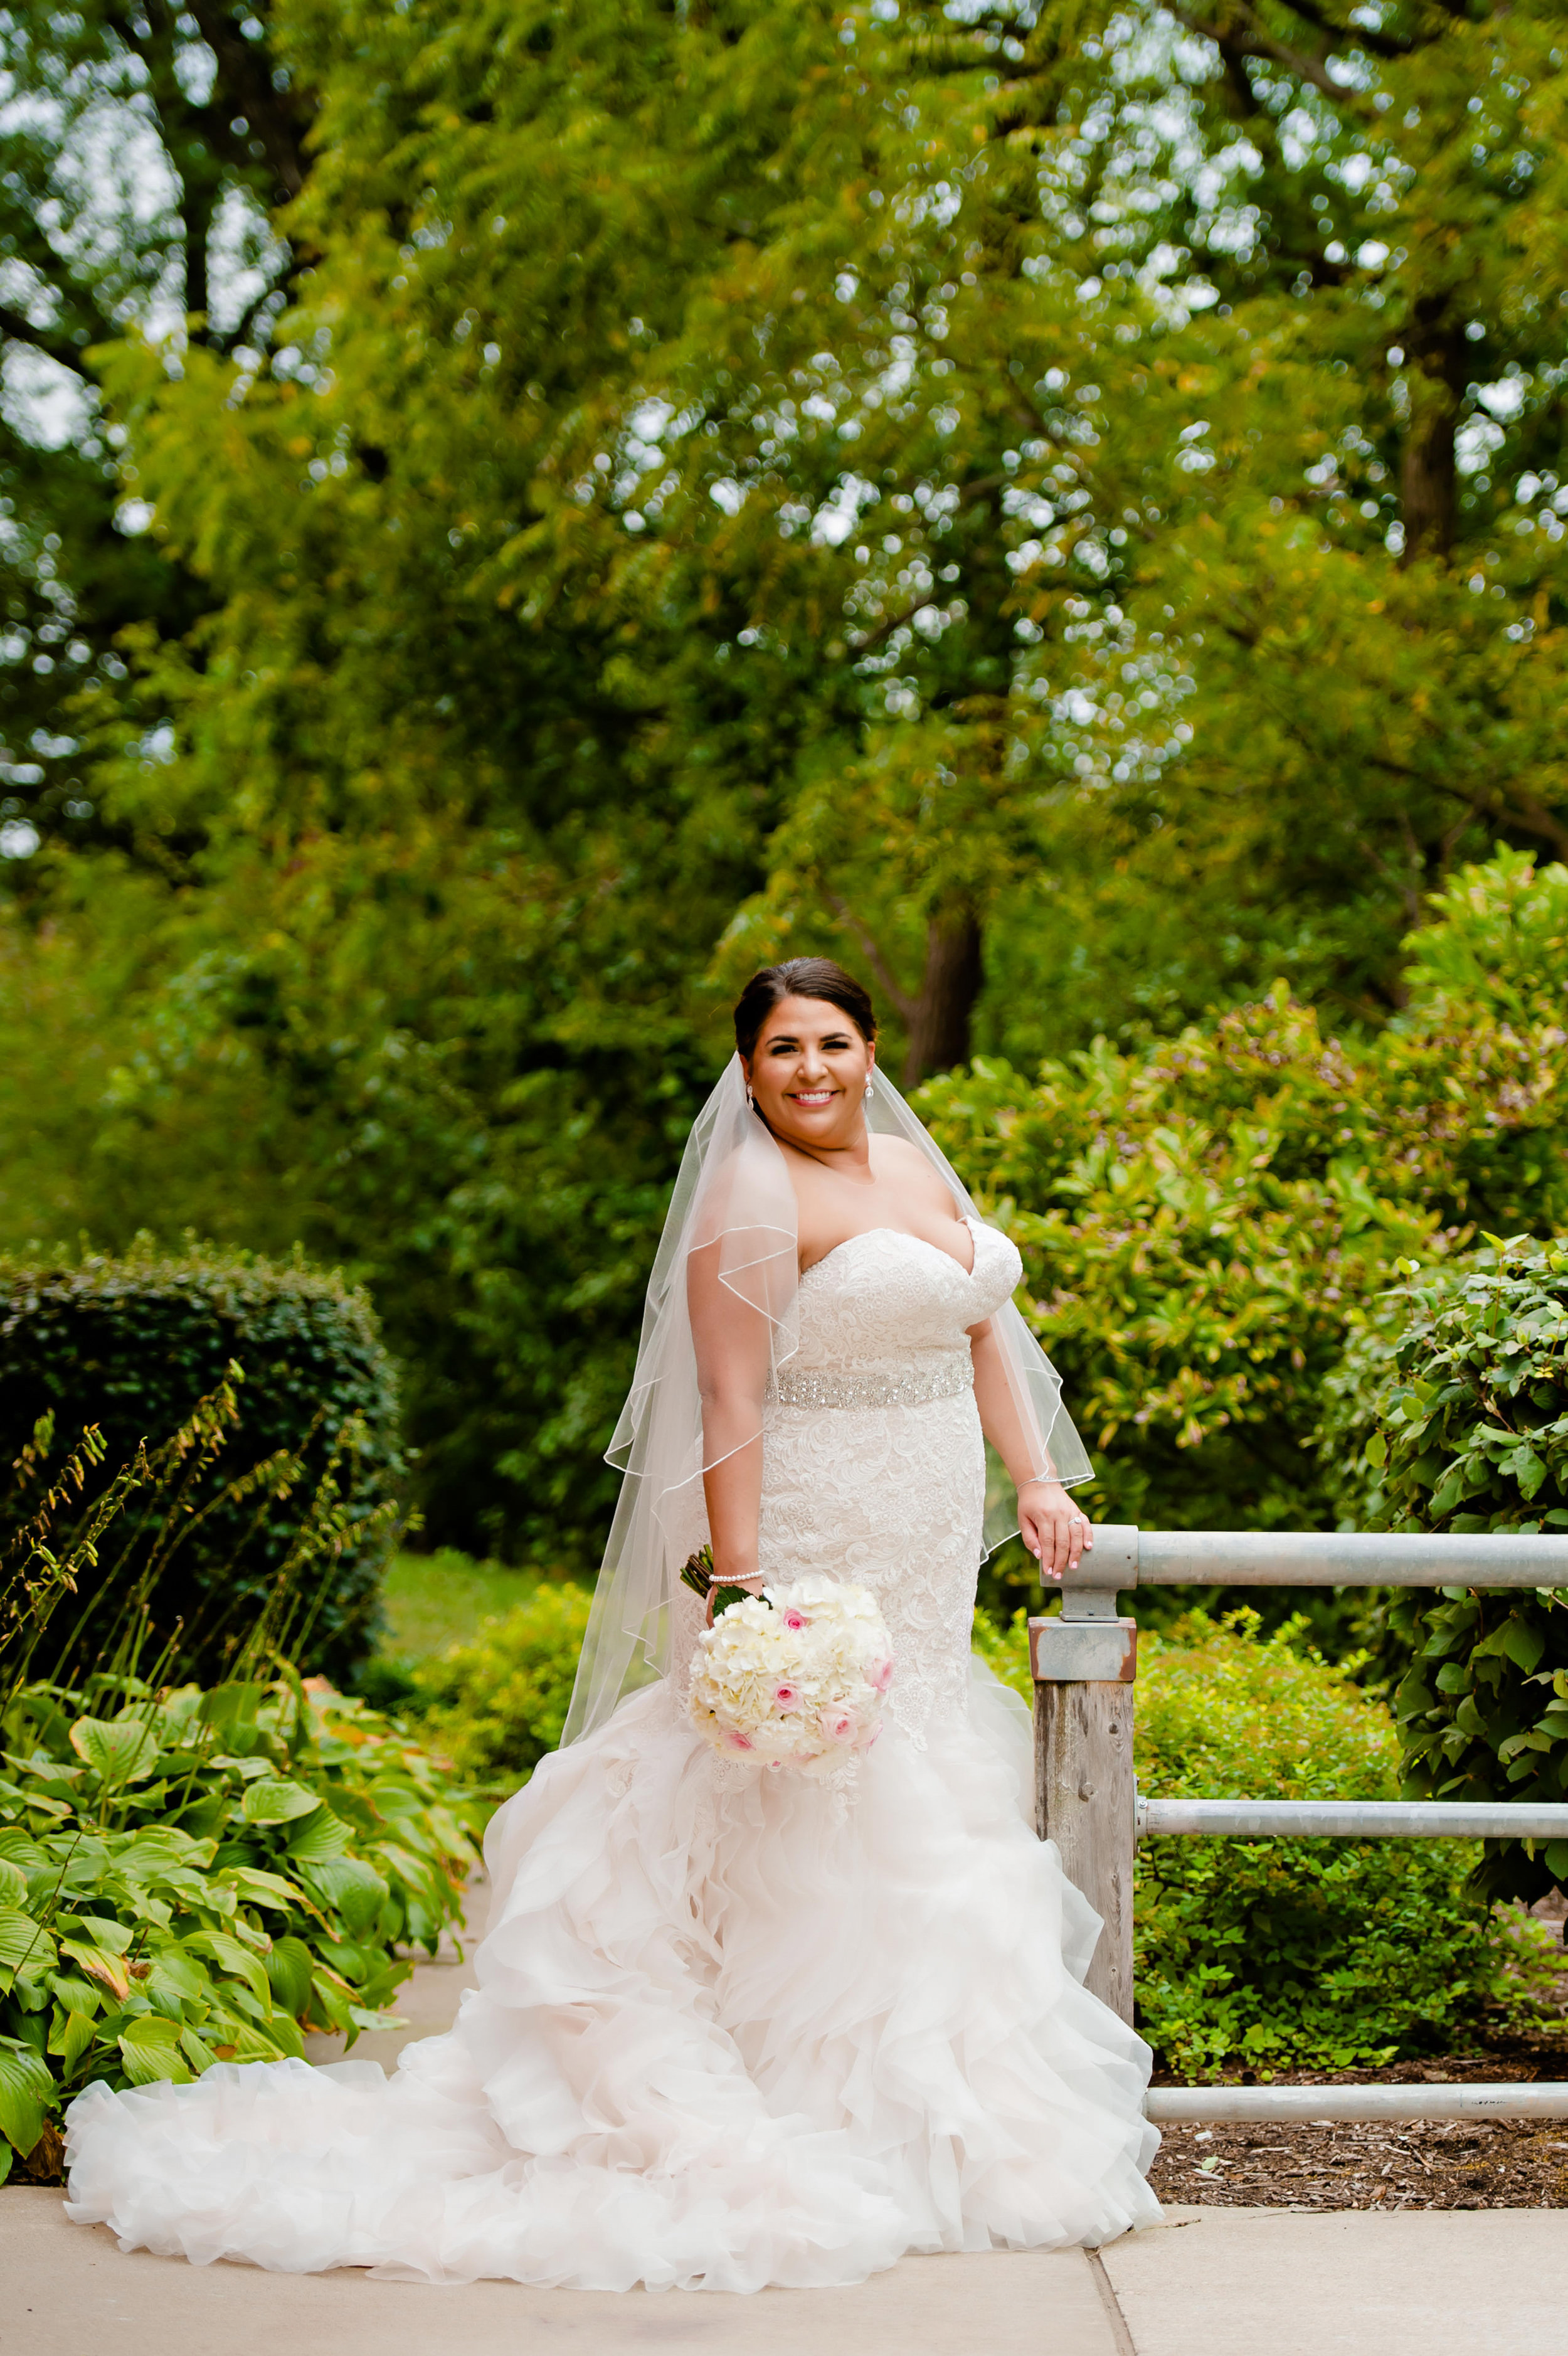 Plus Size Bride - Allure Bridals W365